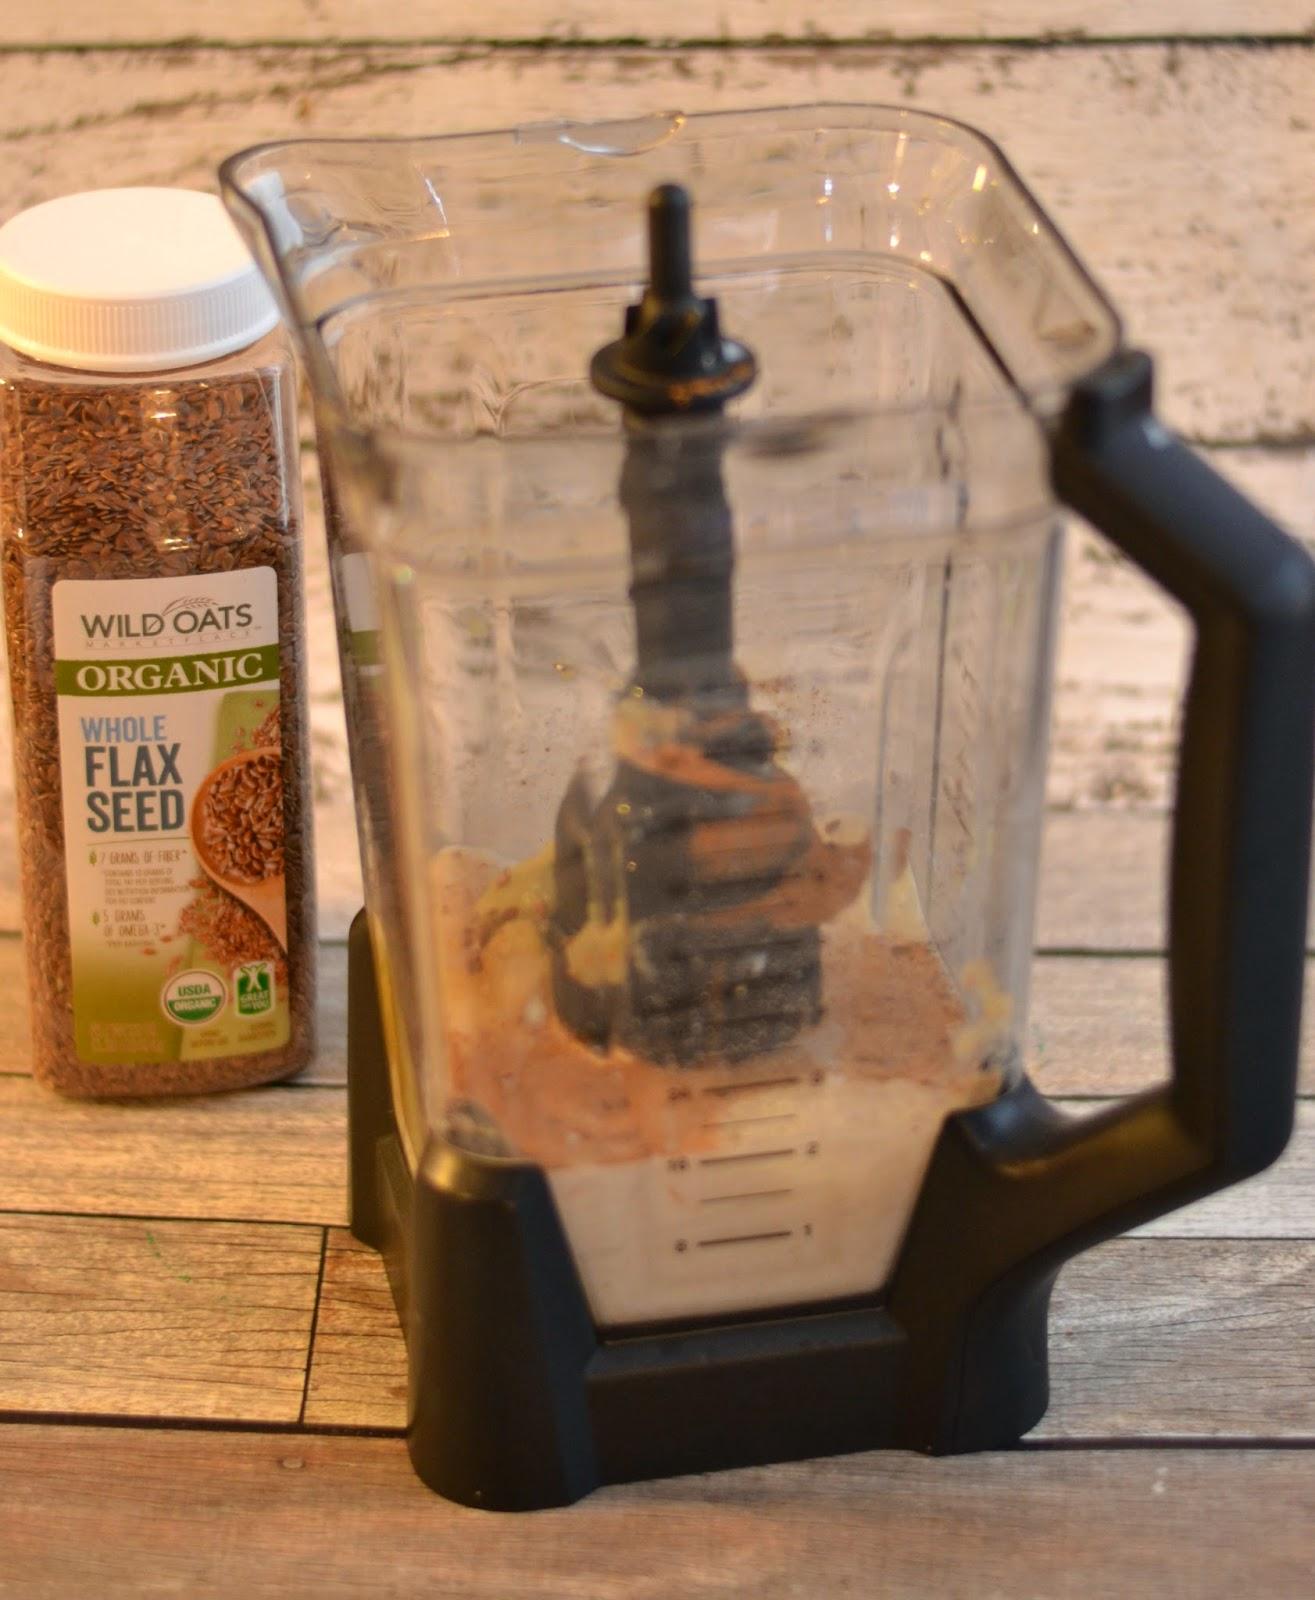 Apple Pie Smoothie.  Applesauce smoothie.  Smoothie recipes.  Easy smoothie recipes.  Smoothies made with applesauce.  Apple smoothies.